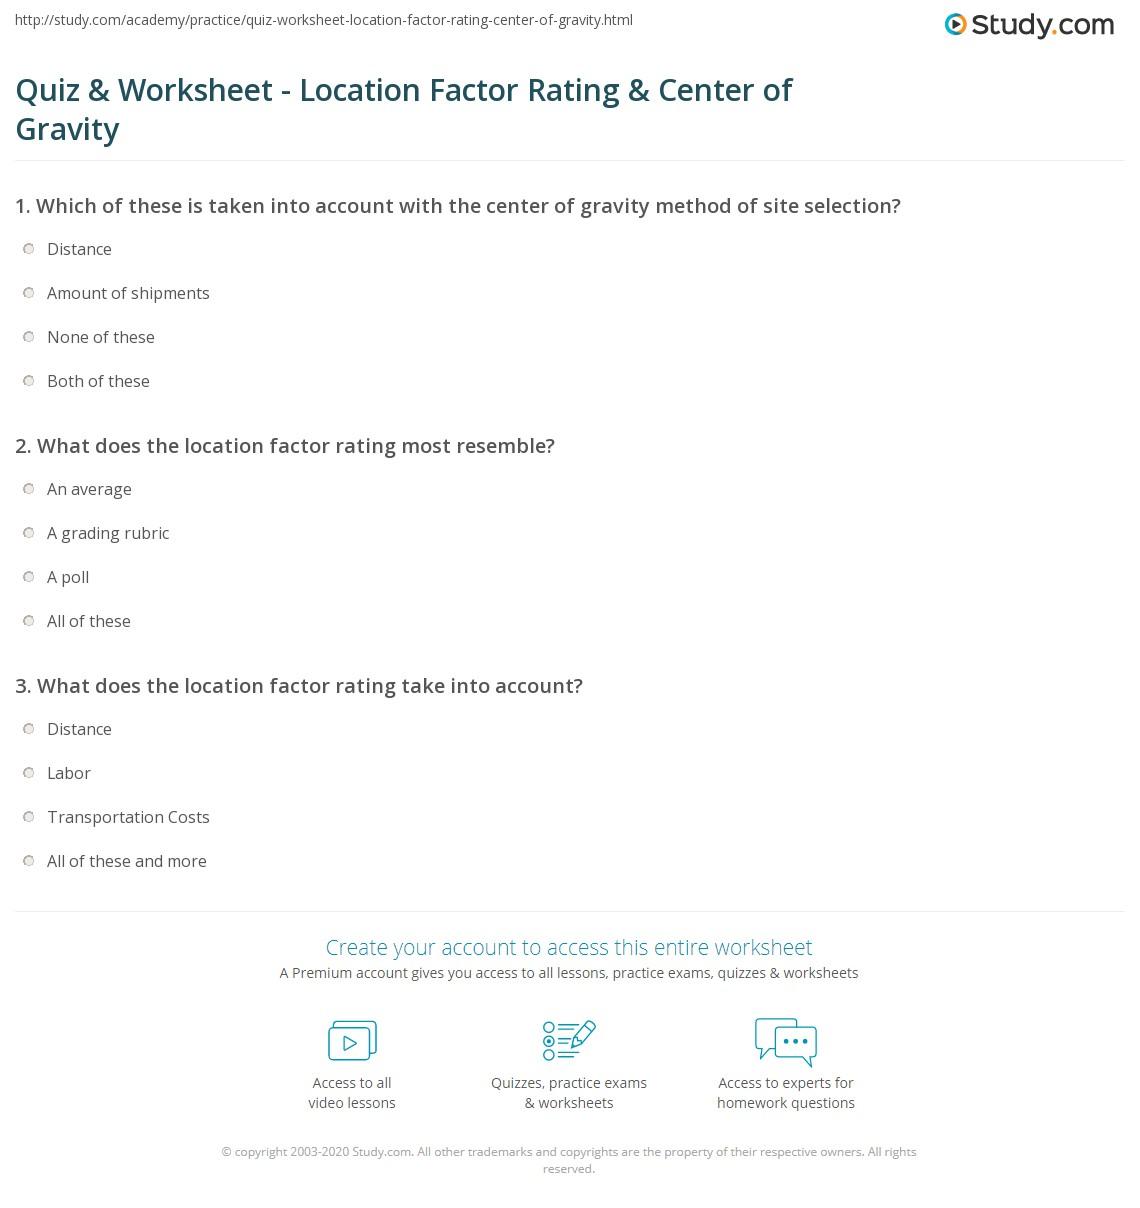 worksheet Gravity Worksheet quiz worksheet location factor rating center of gravity print in site planning worksheet